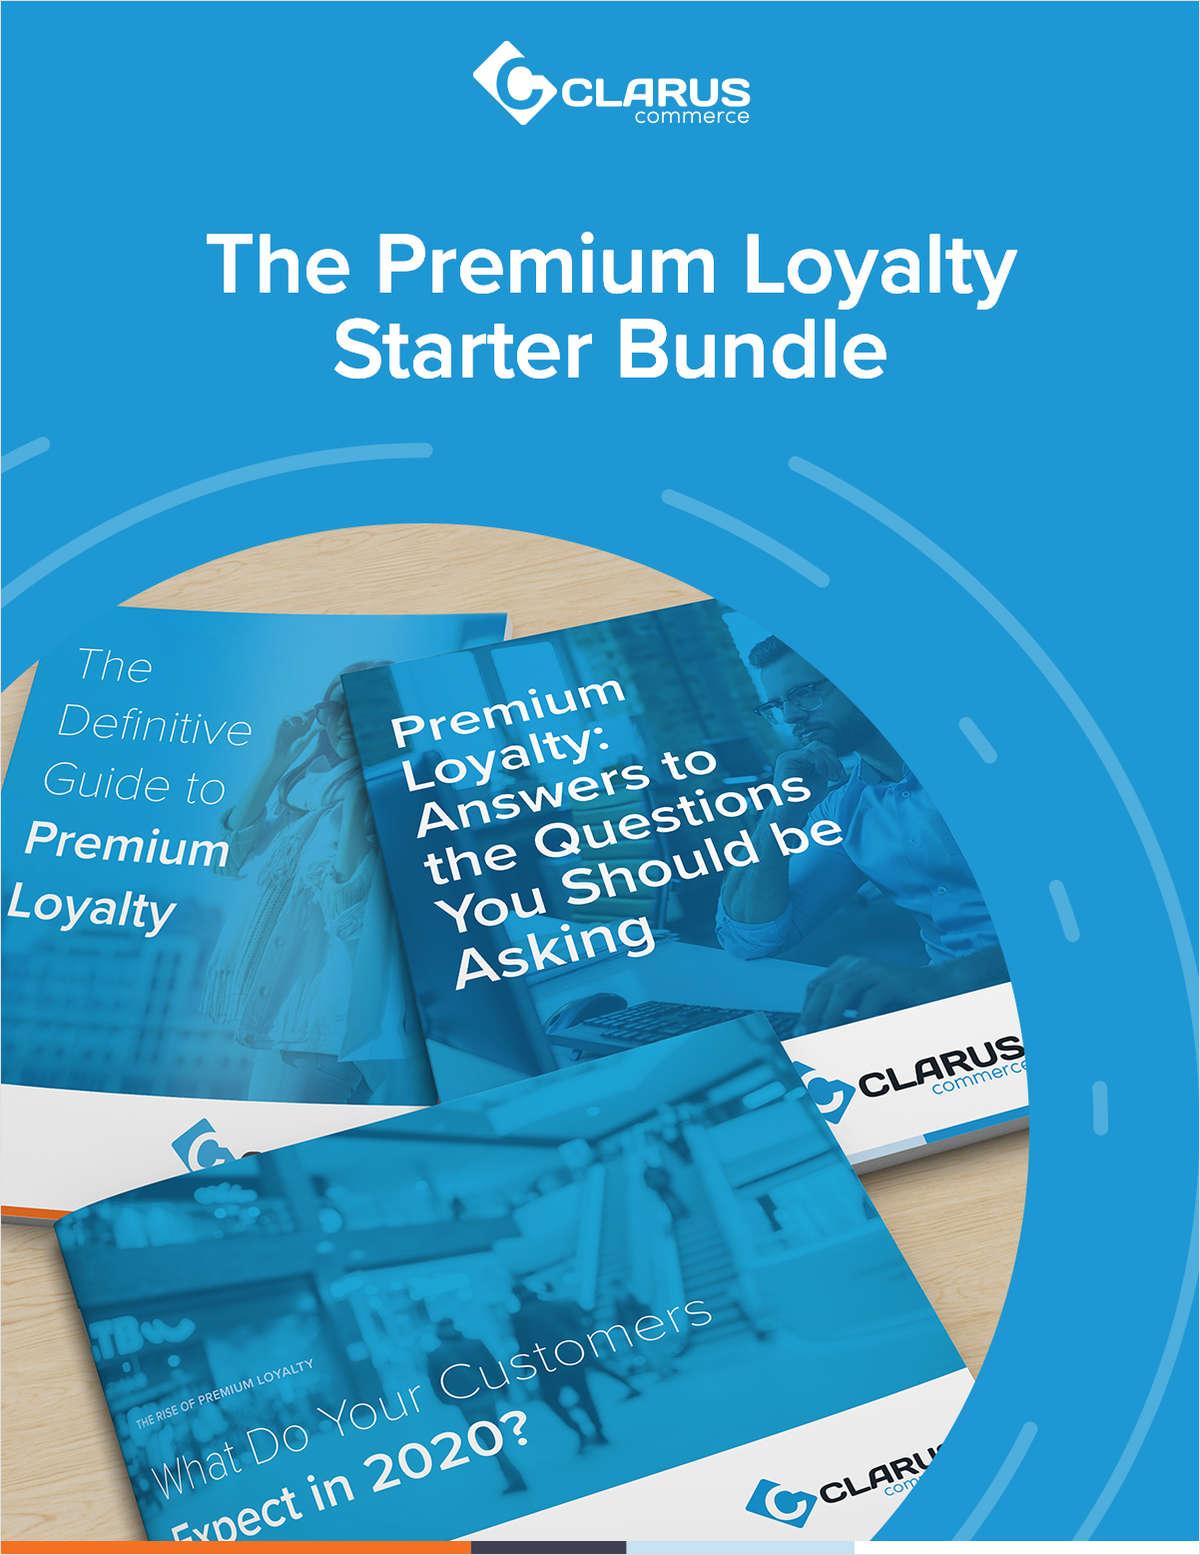 The Premium Loyalty Starter Bundle